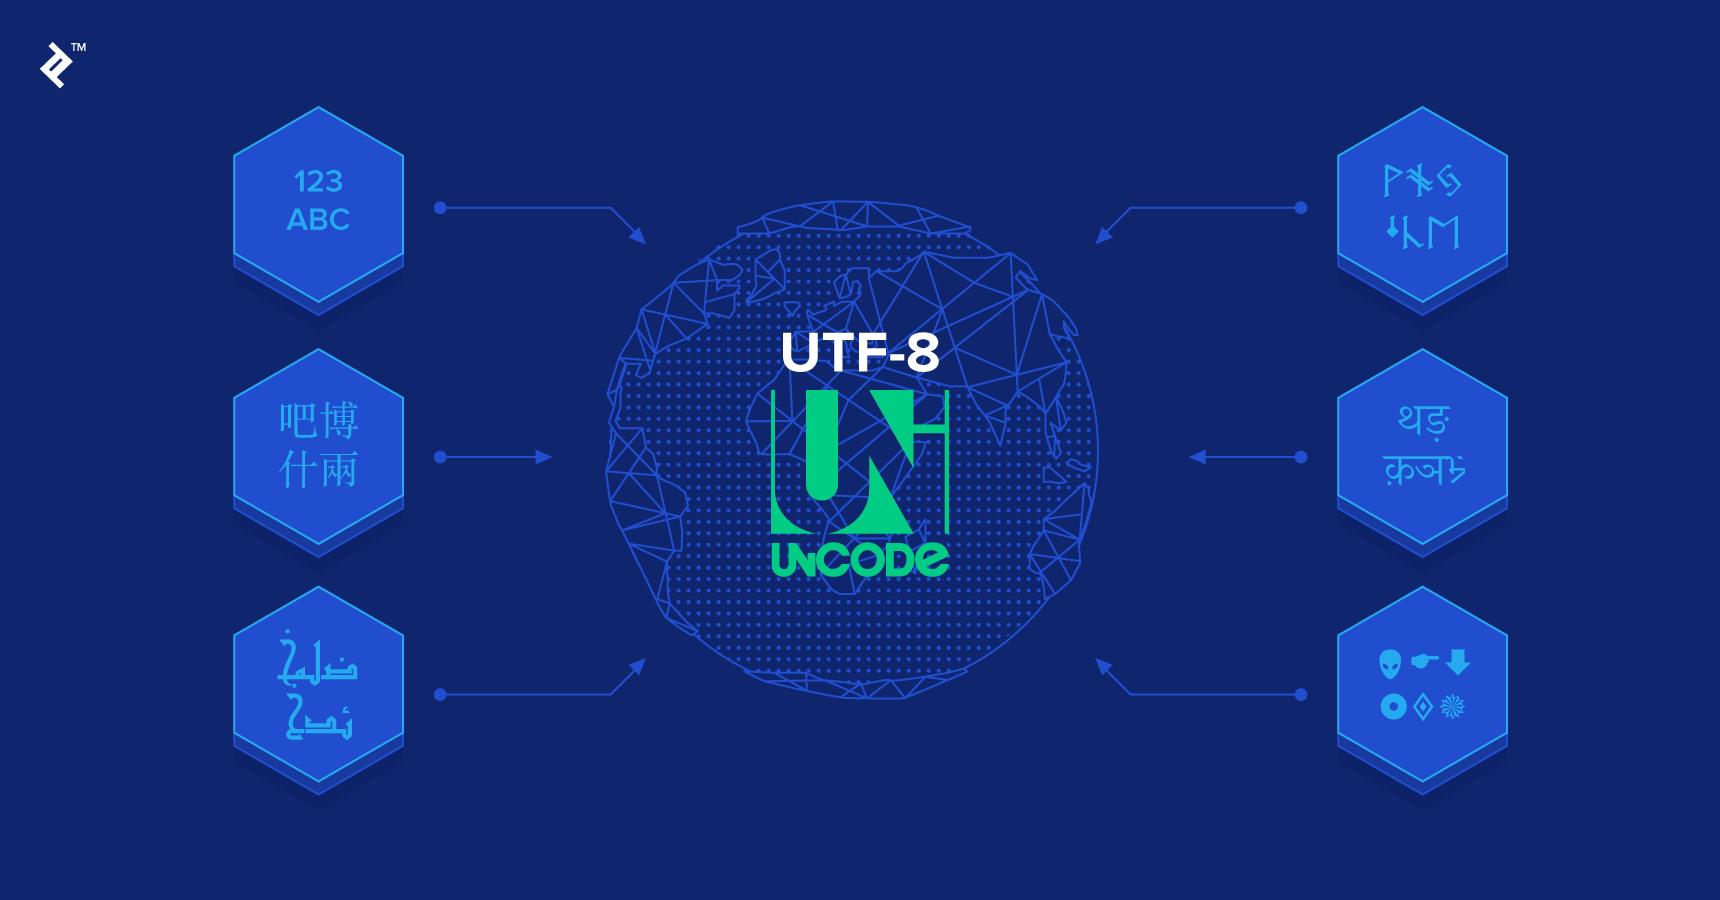 Utf 8 Table Polish.A Guide To Mysql And Php Utf 8 Encoding Toptal